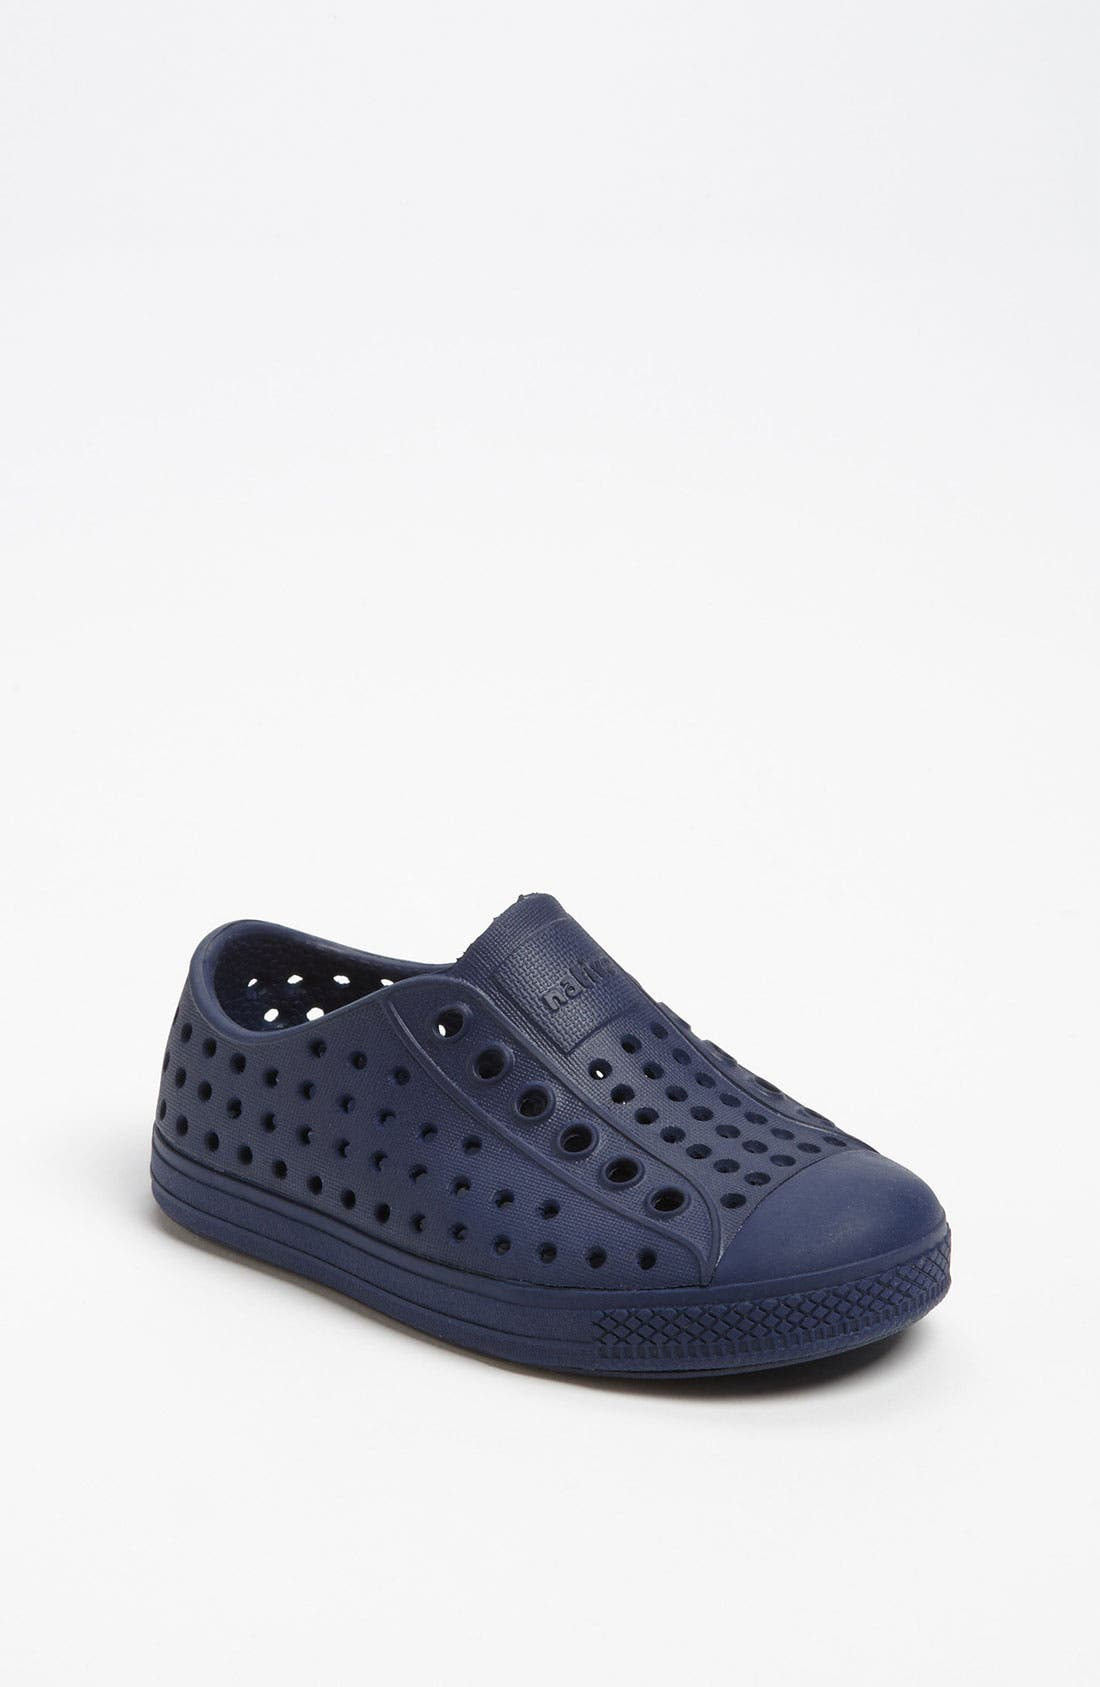 Alternate Image 1 Selected - Native Shoes 'Jefferson' Slip-On (Baby, Walker, Toddler & Little Kid)